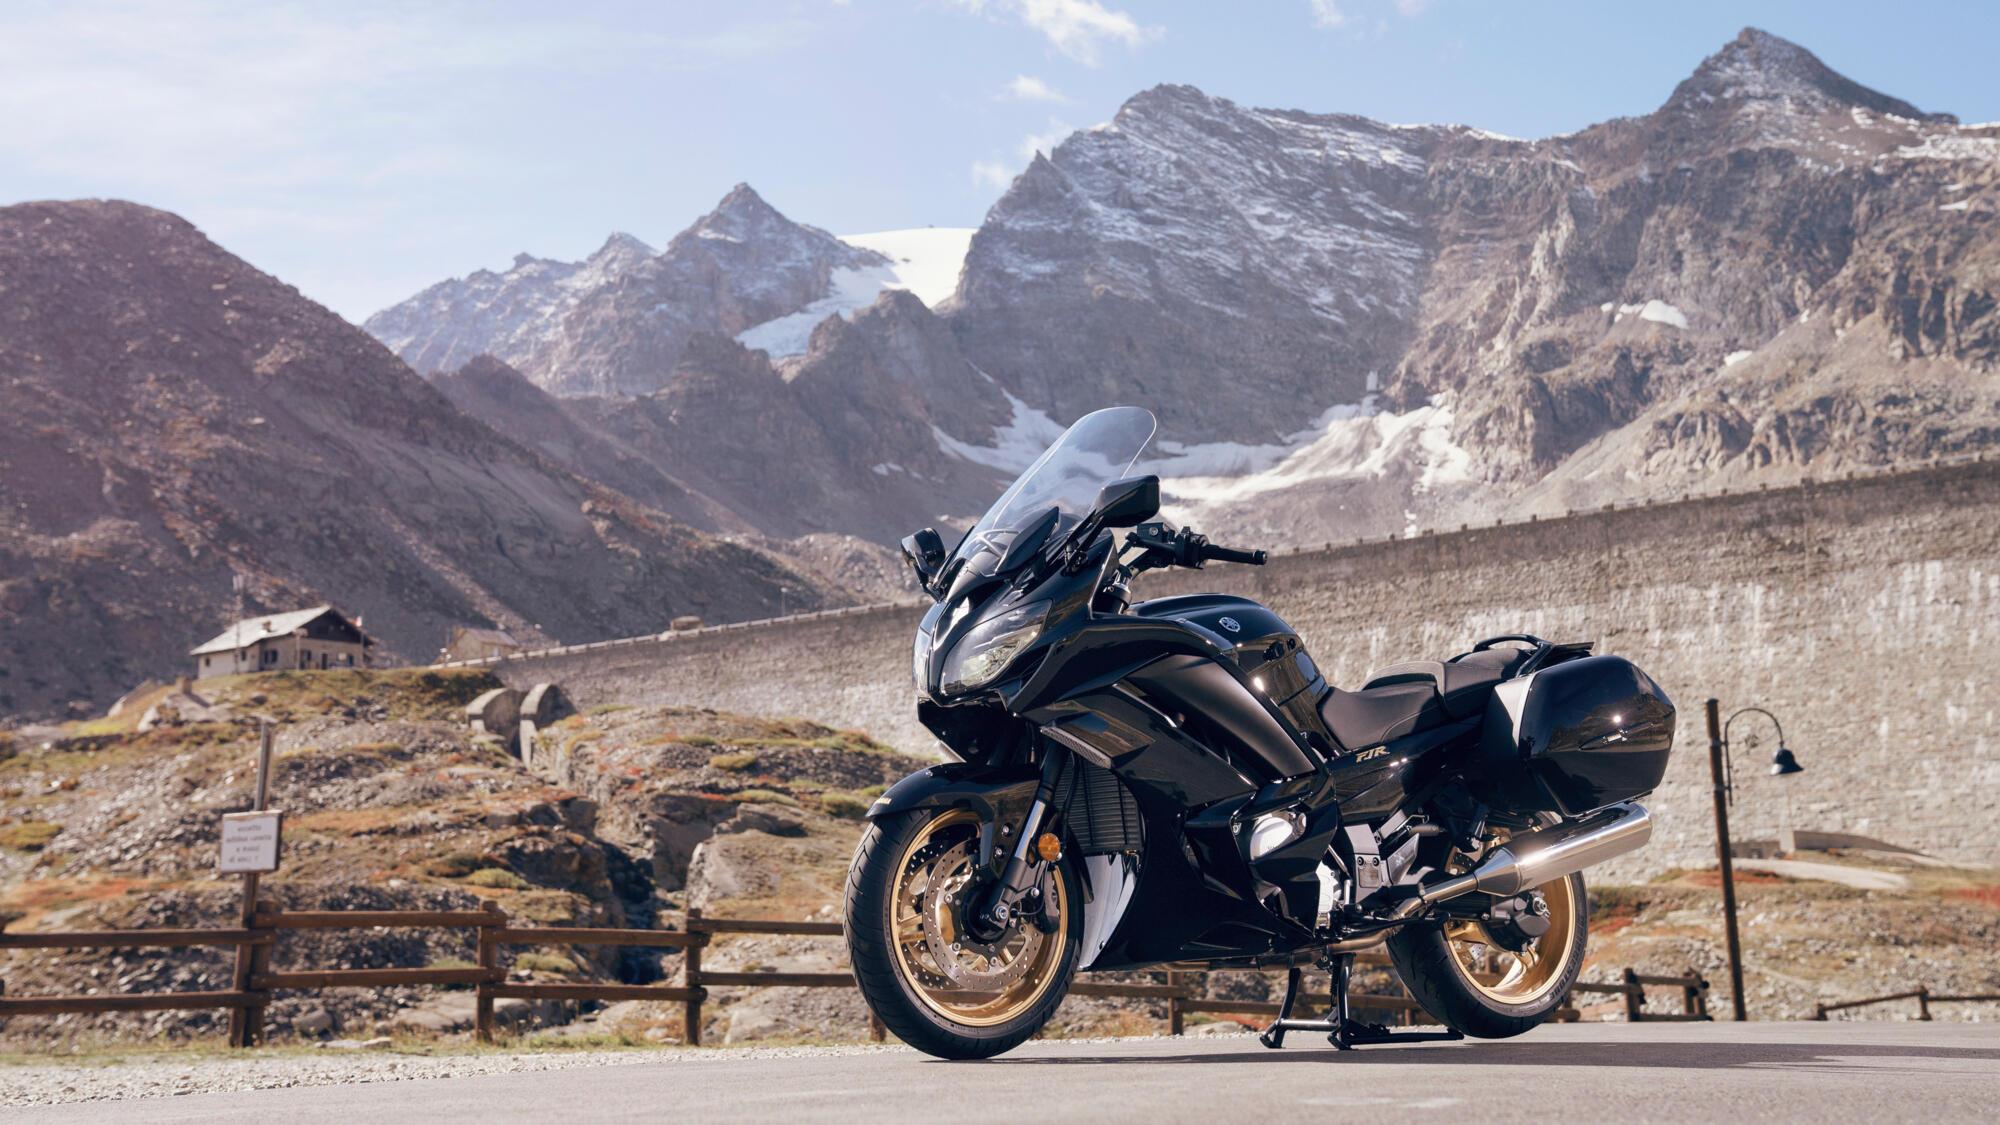 Yamaha FJR1300 | MotorCentrumWest